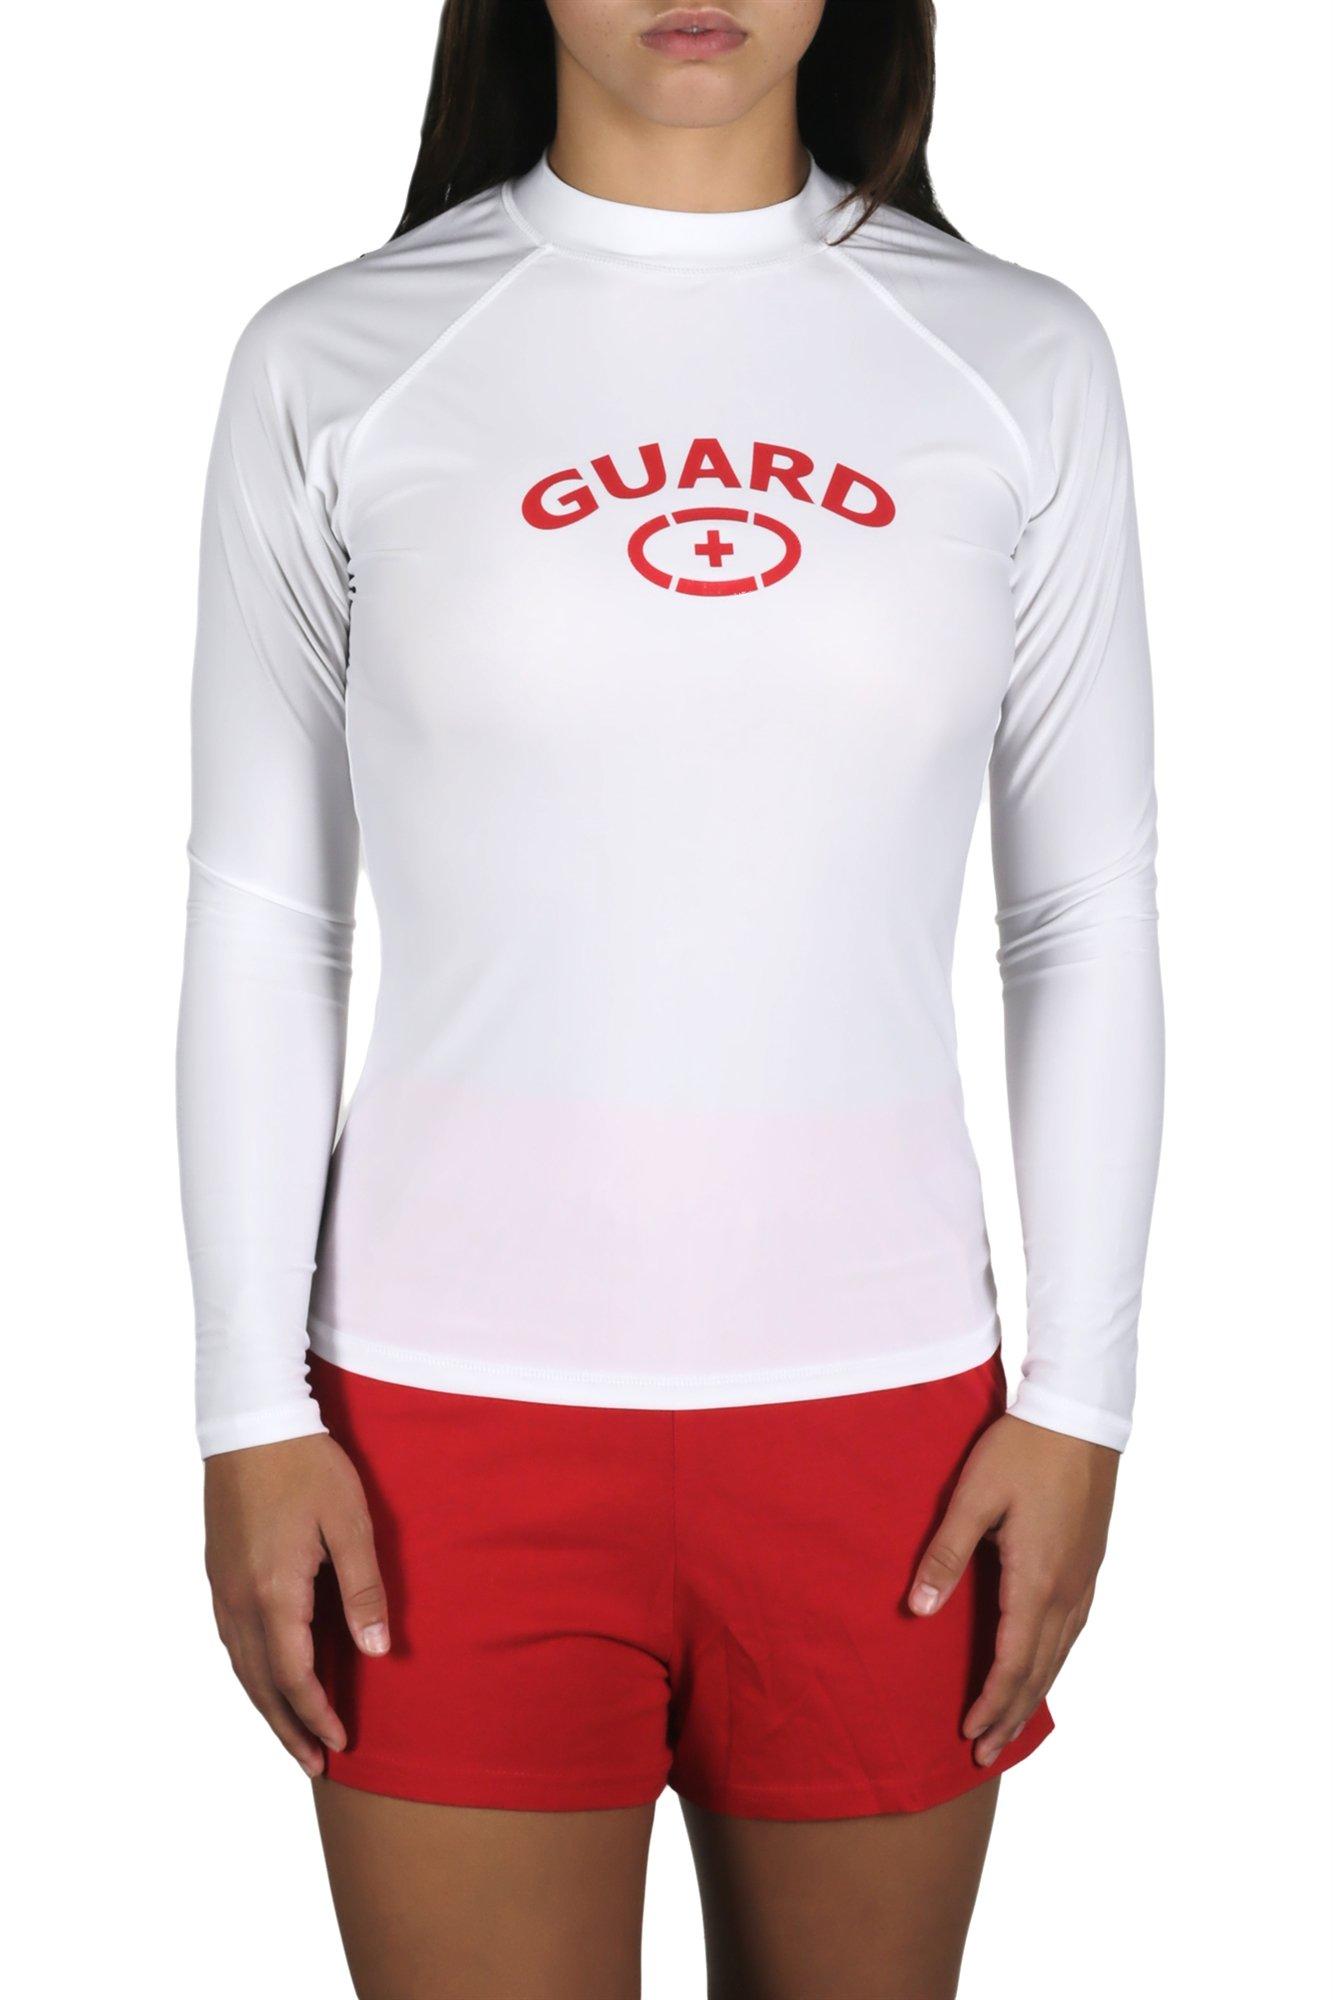 Adoretex Women's Guard Rashguard Long Sleeve Swim Shirt (White, Medium) by Adoretex